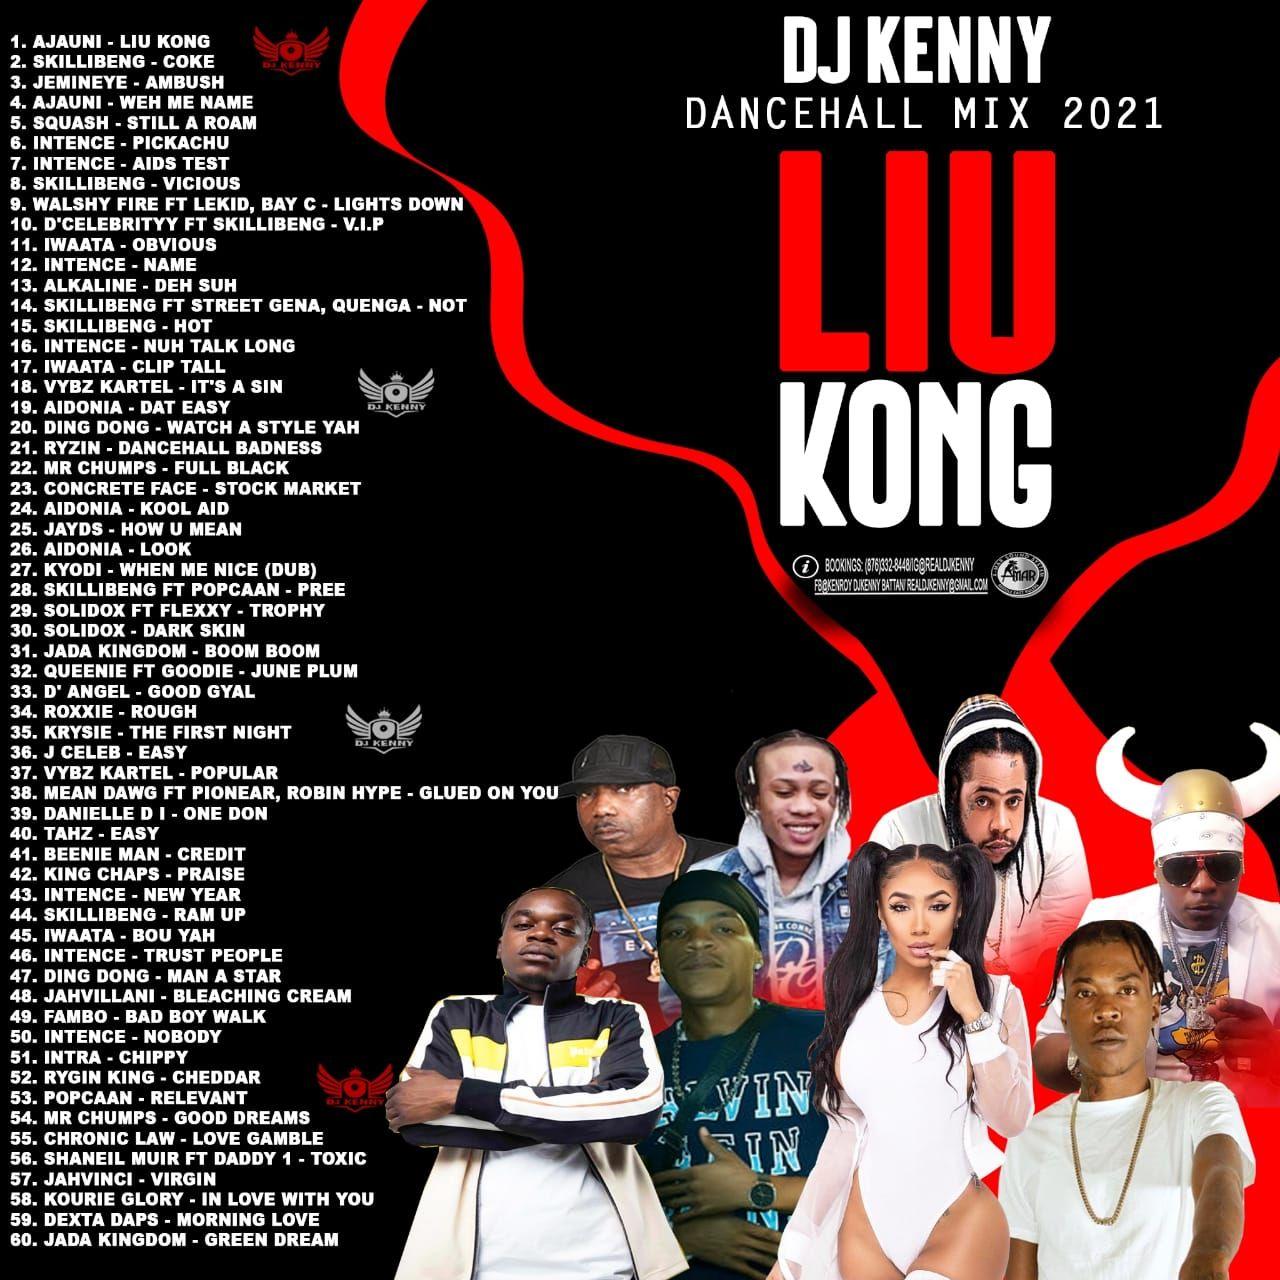 dj kenny liu kong dancehall mix